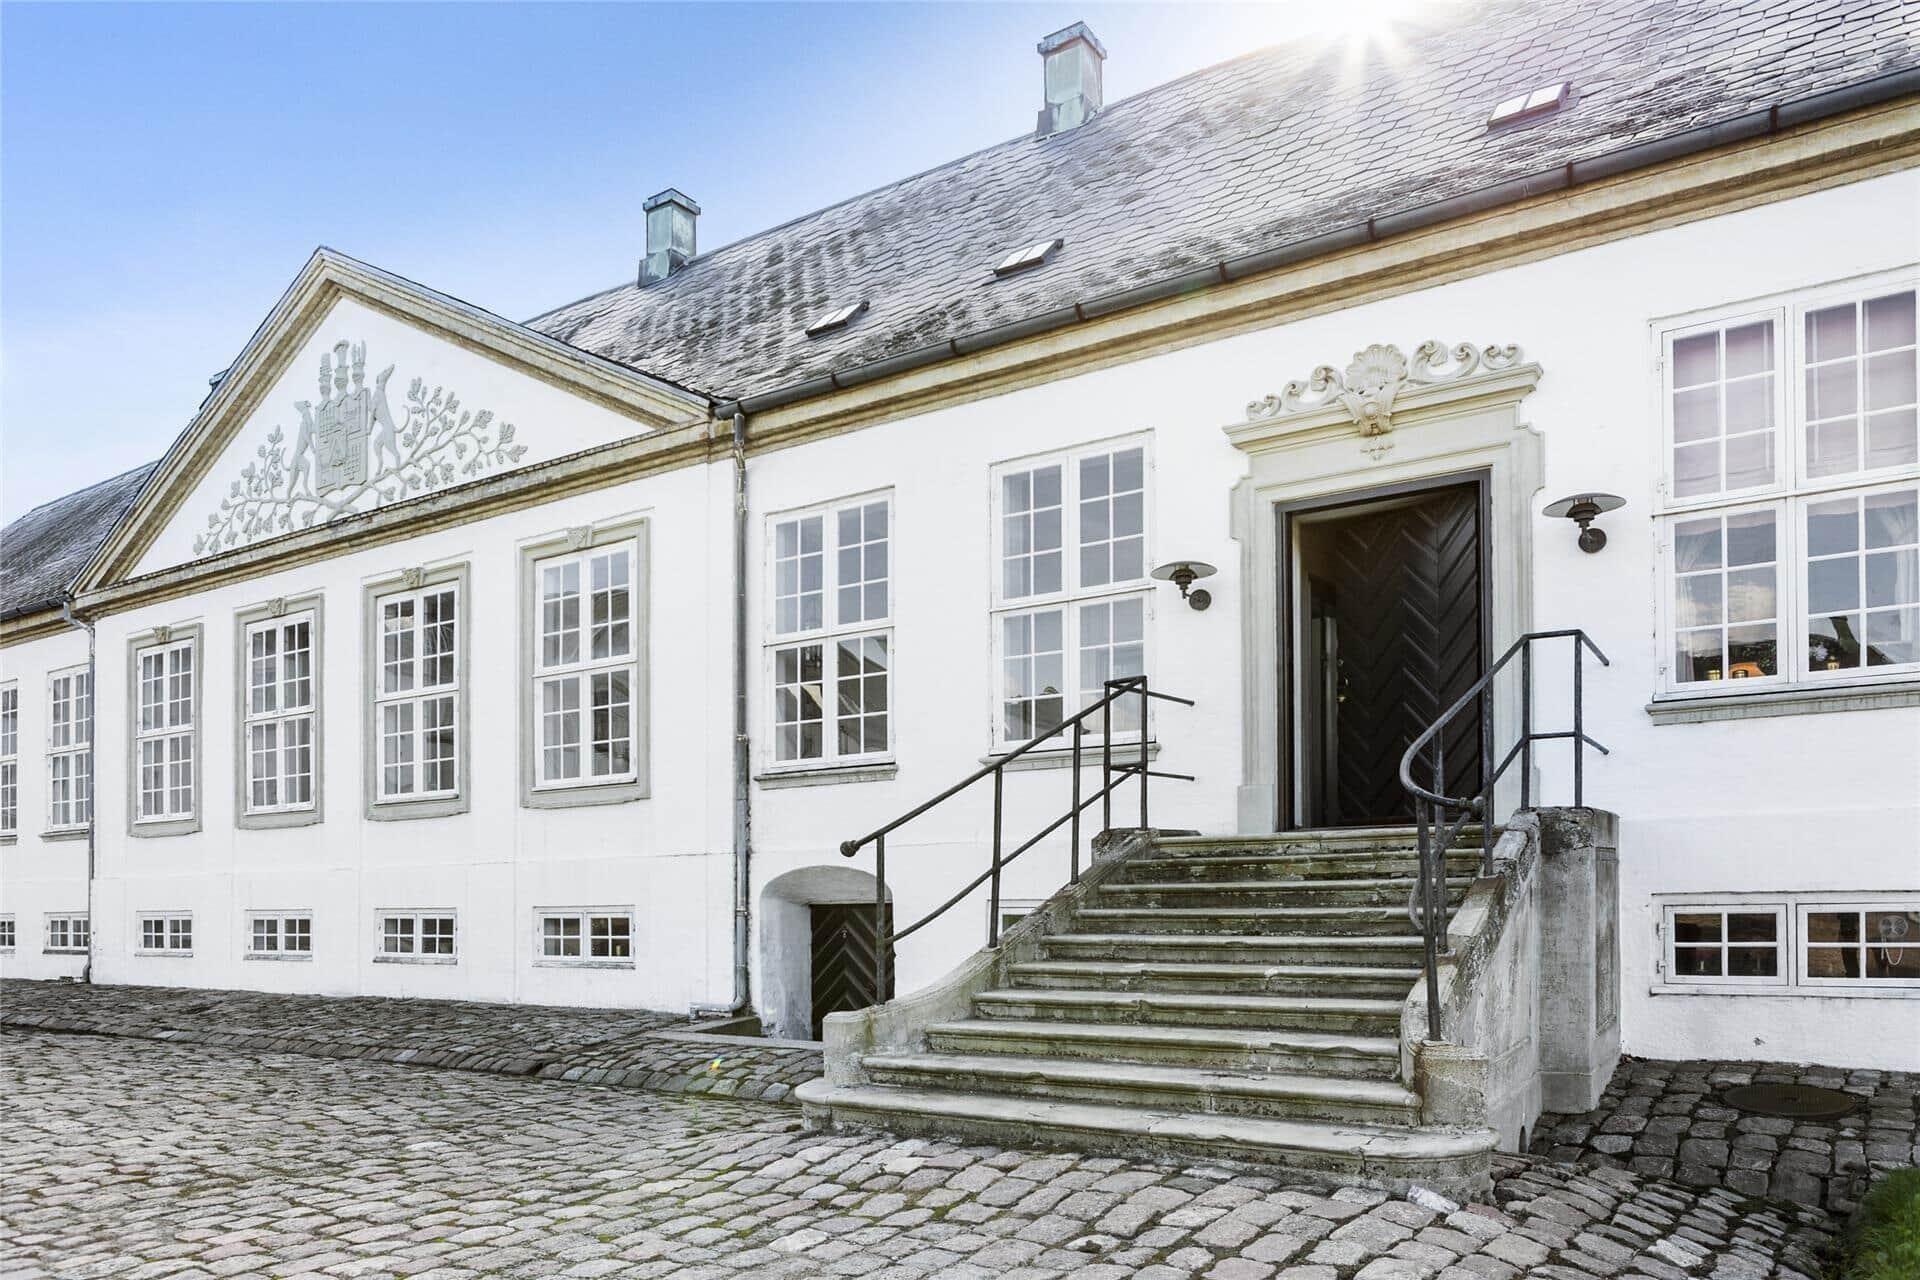 Bild 1-3 Ferienhaus S90016, Lerchenborg 3, DK - 4400 Kalundborg